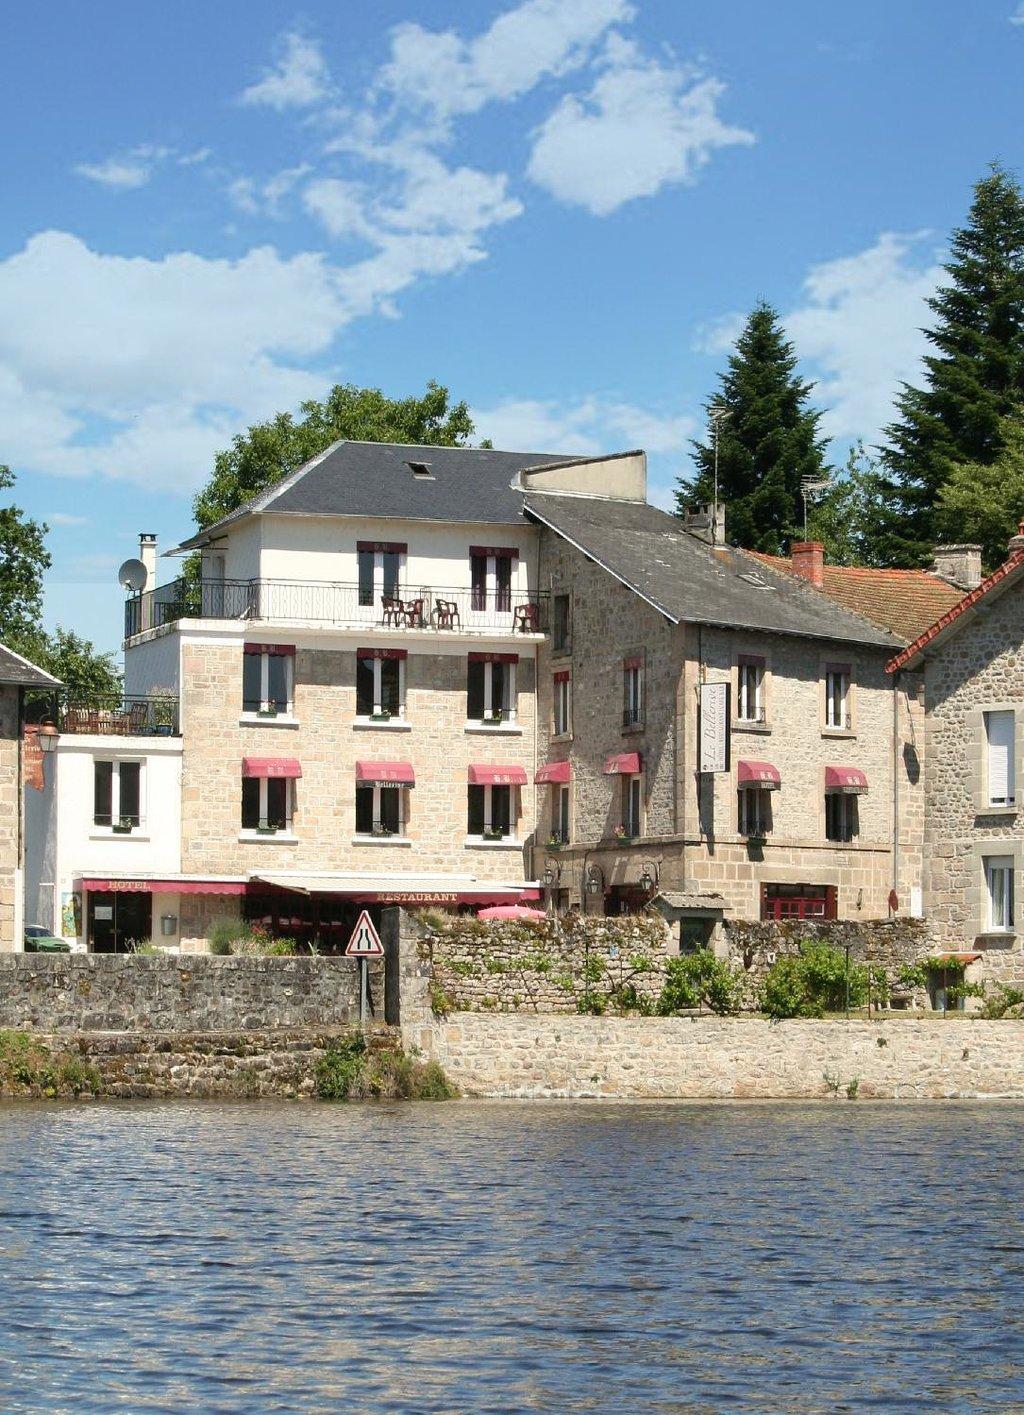 Hotel-Restaurant-Bar Le Bellerive